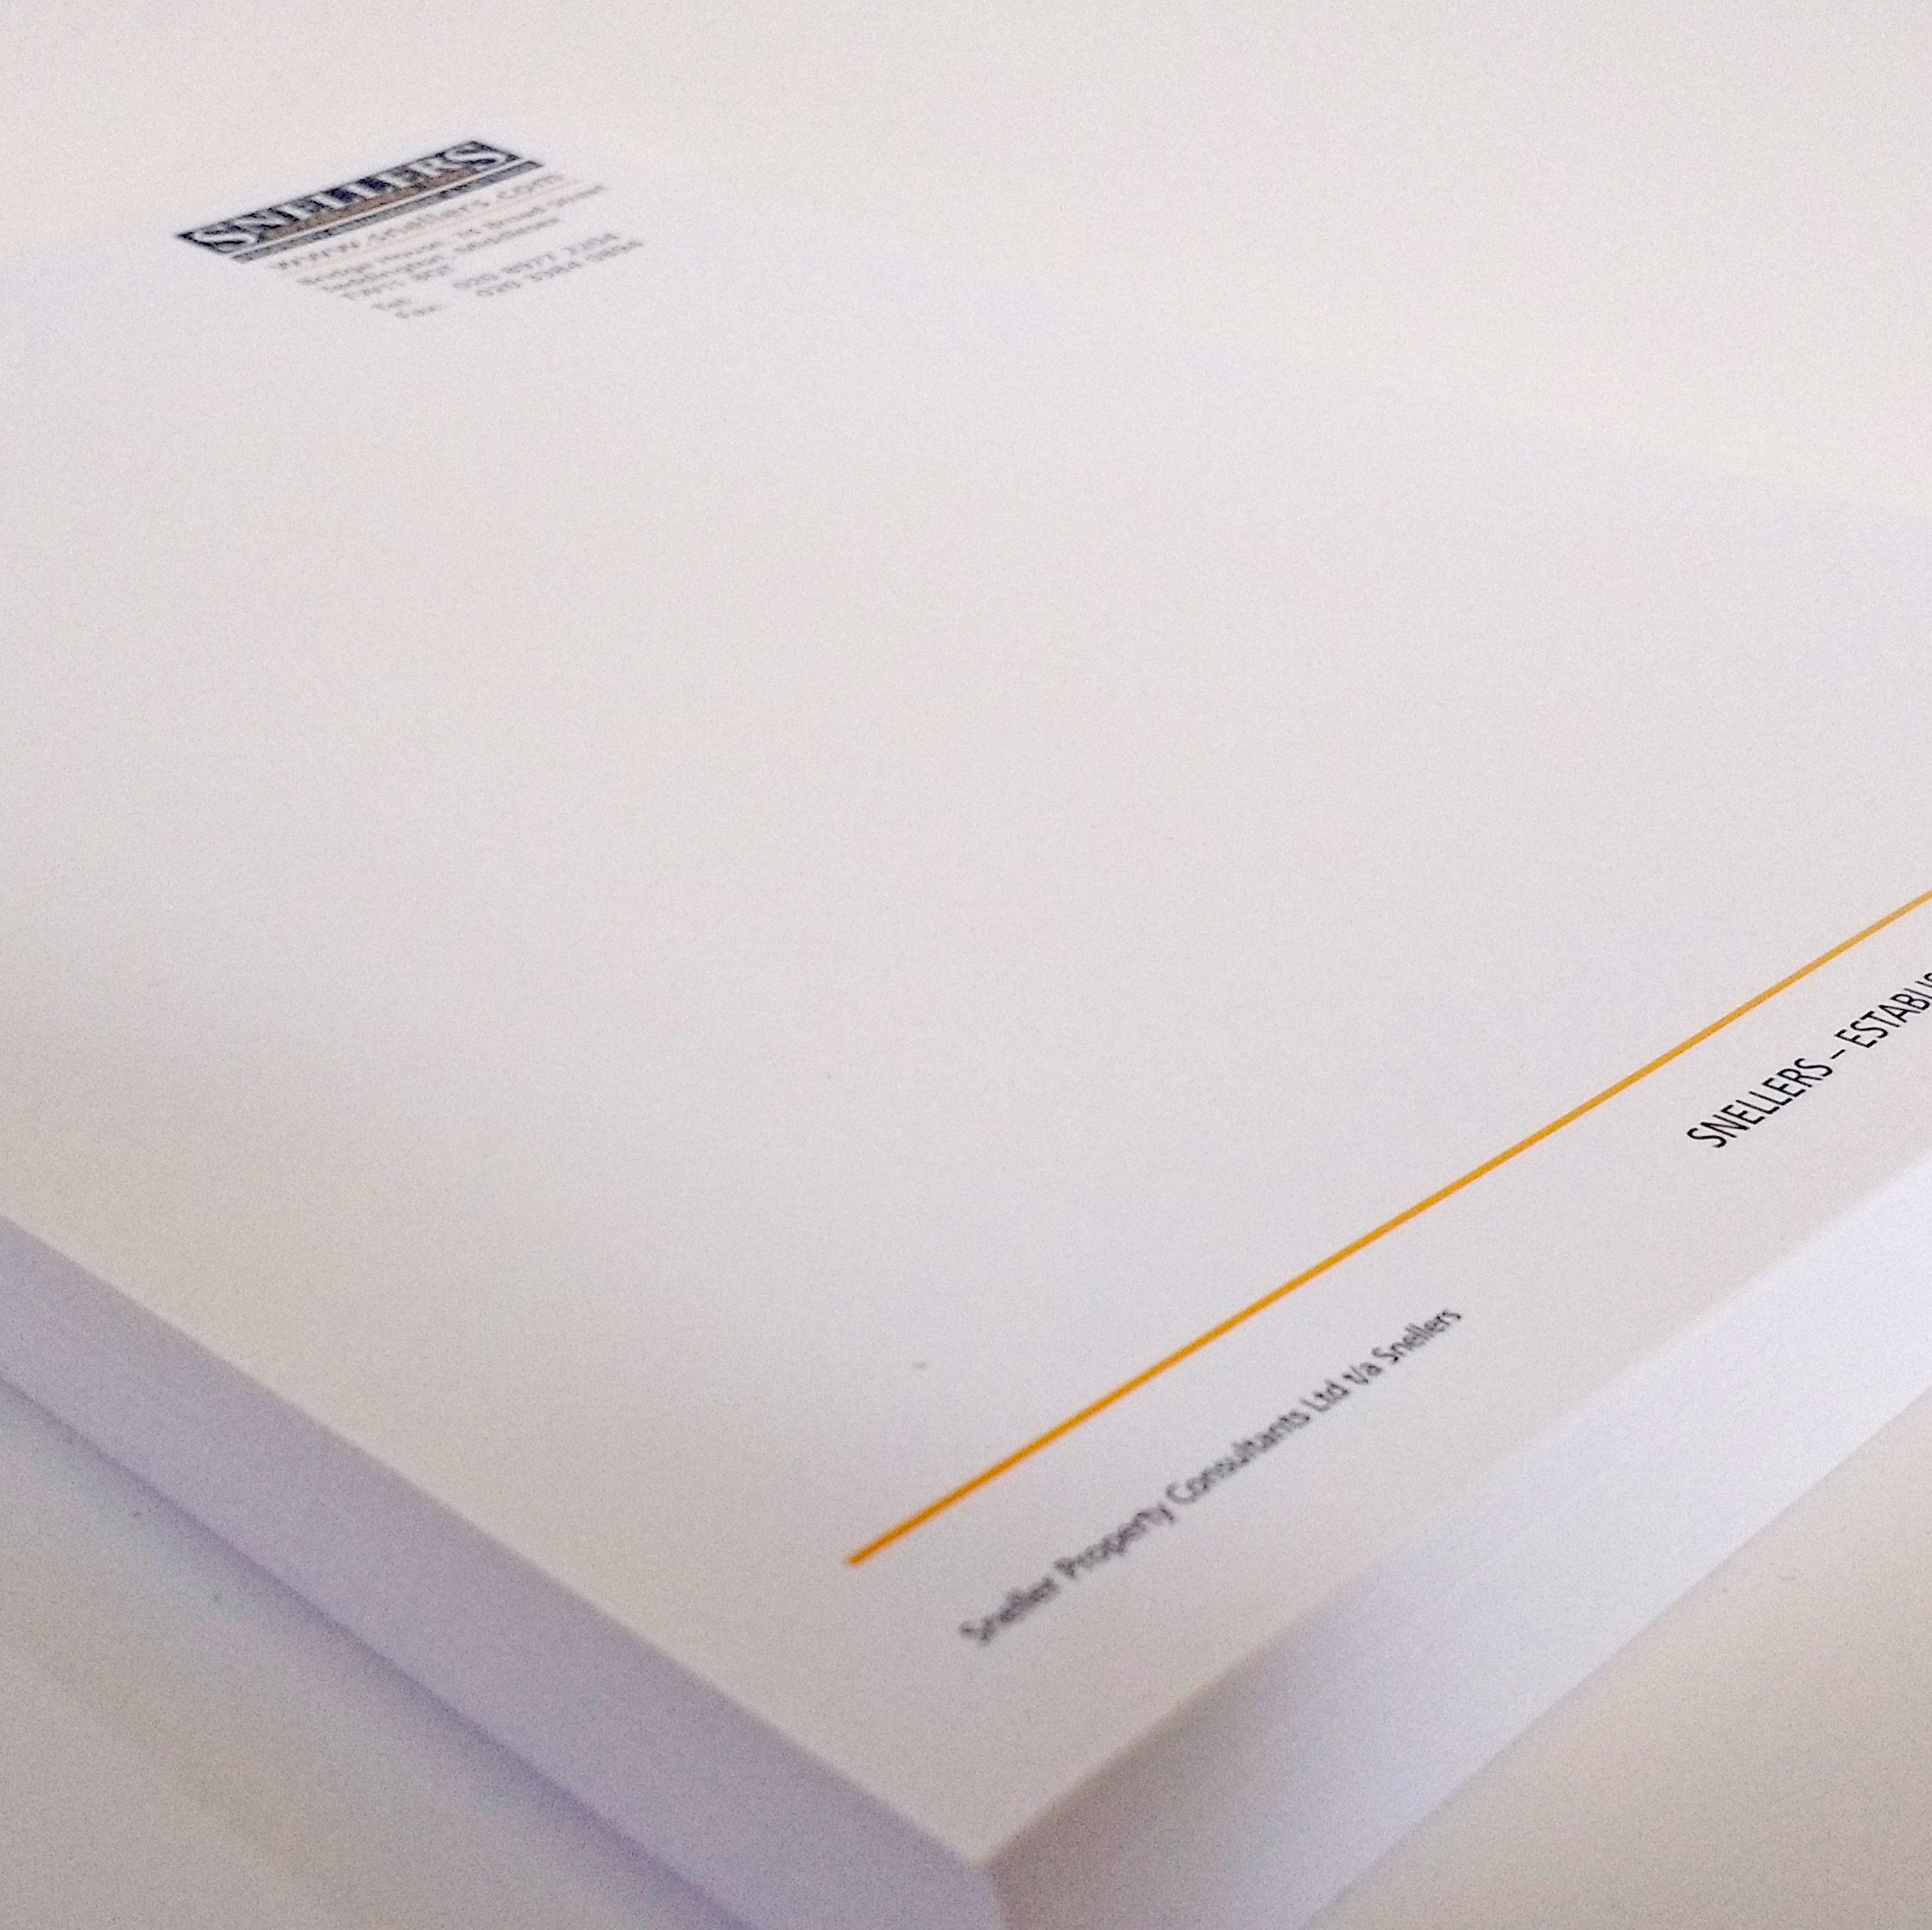 Stationery - Letterhead